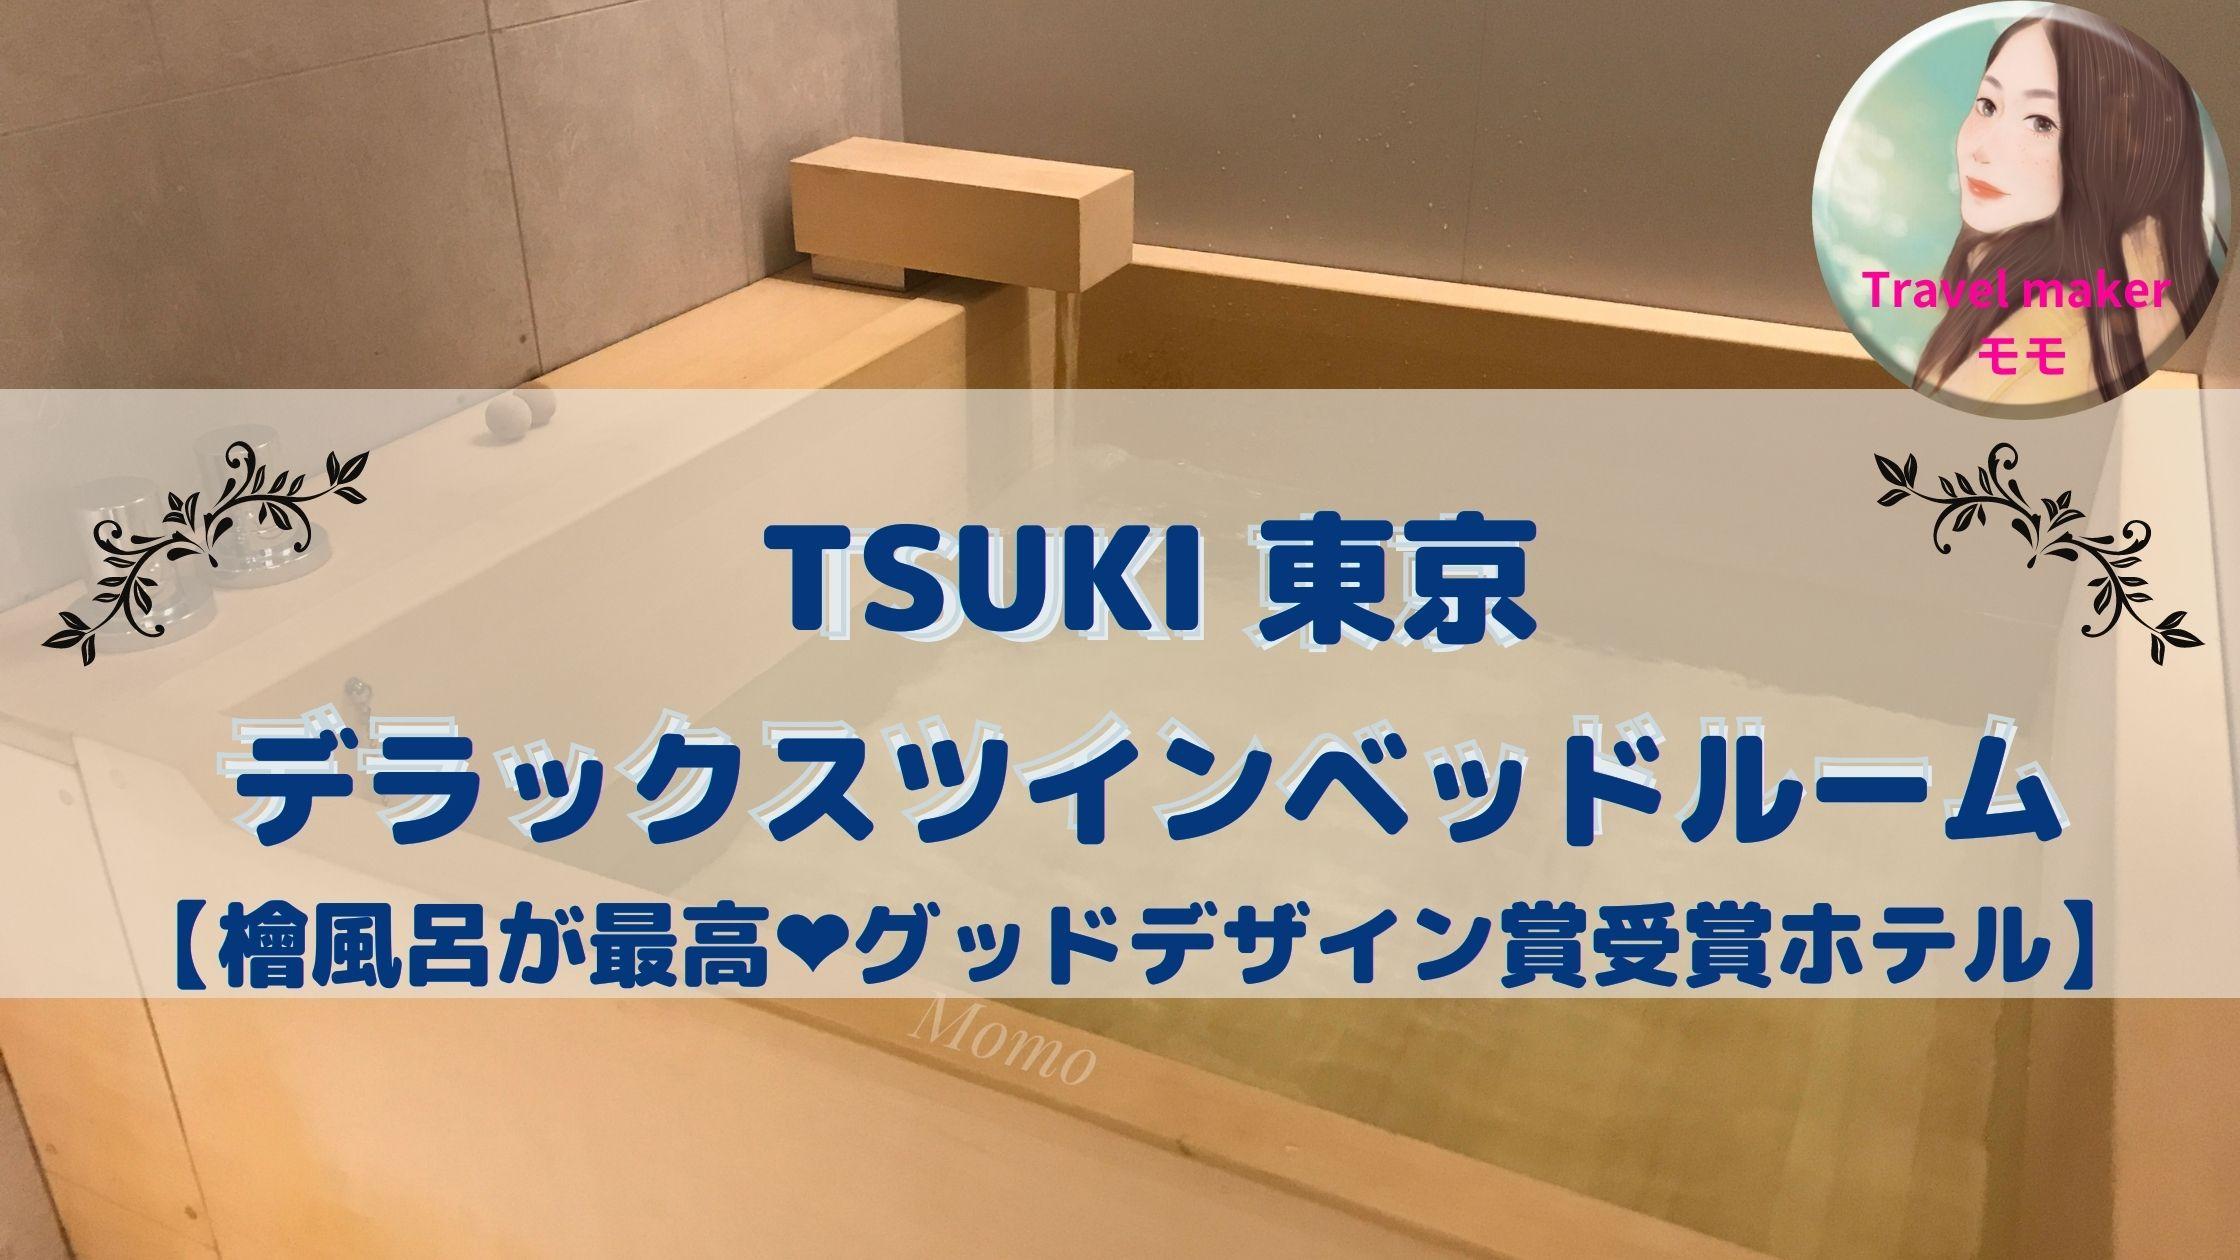 TSUKI東京 ブログ 宿泊